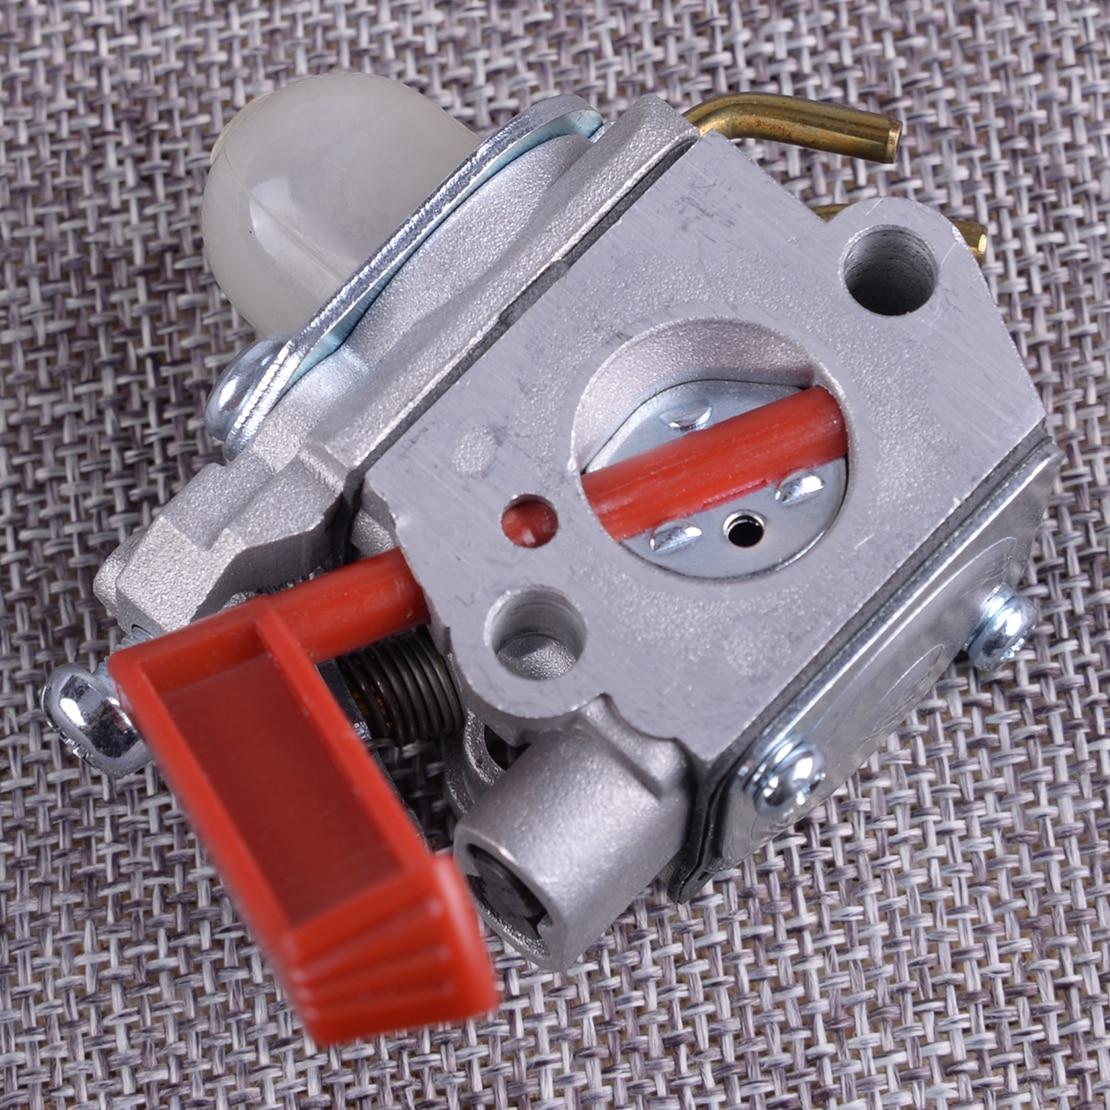 LETAOSK Carburetor Carb 984534001 Fit For Homelite F2020 UT-20788 F2020 UT-20789 F3040 UT-15176